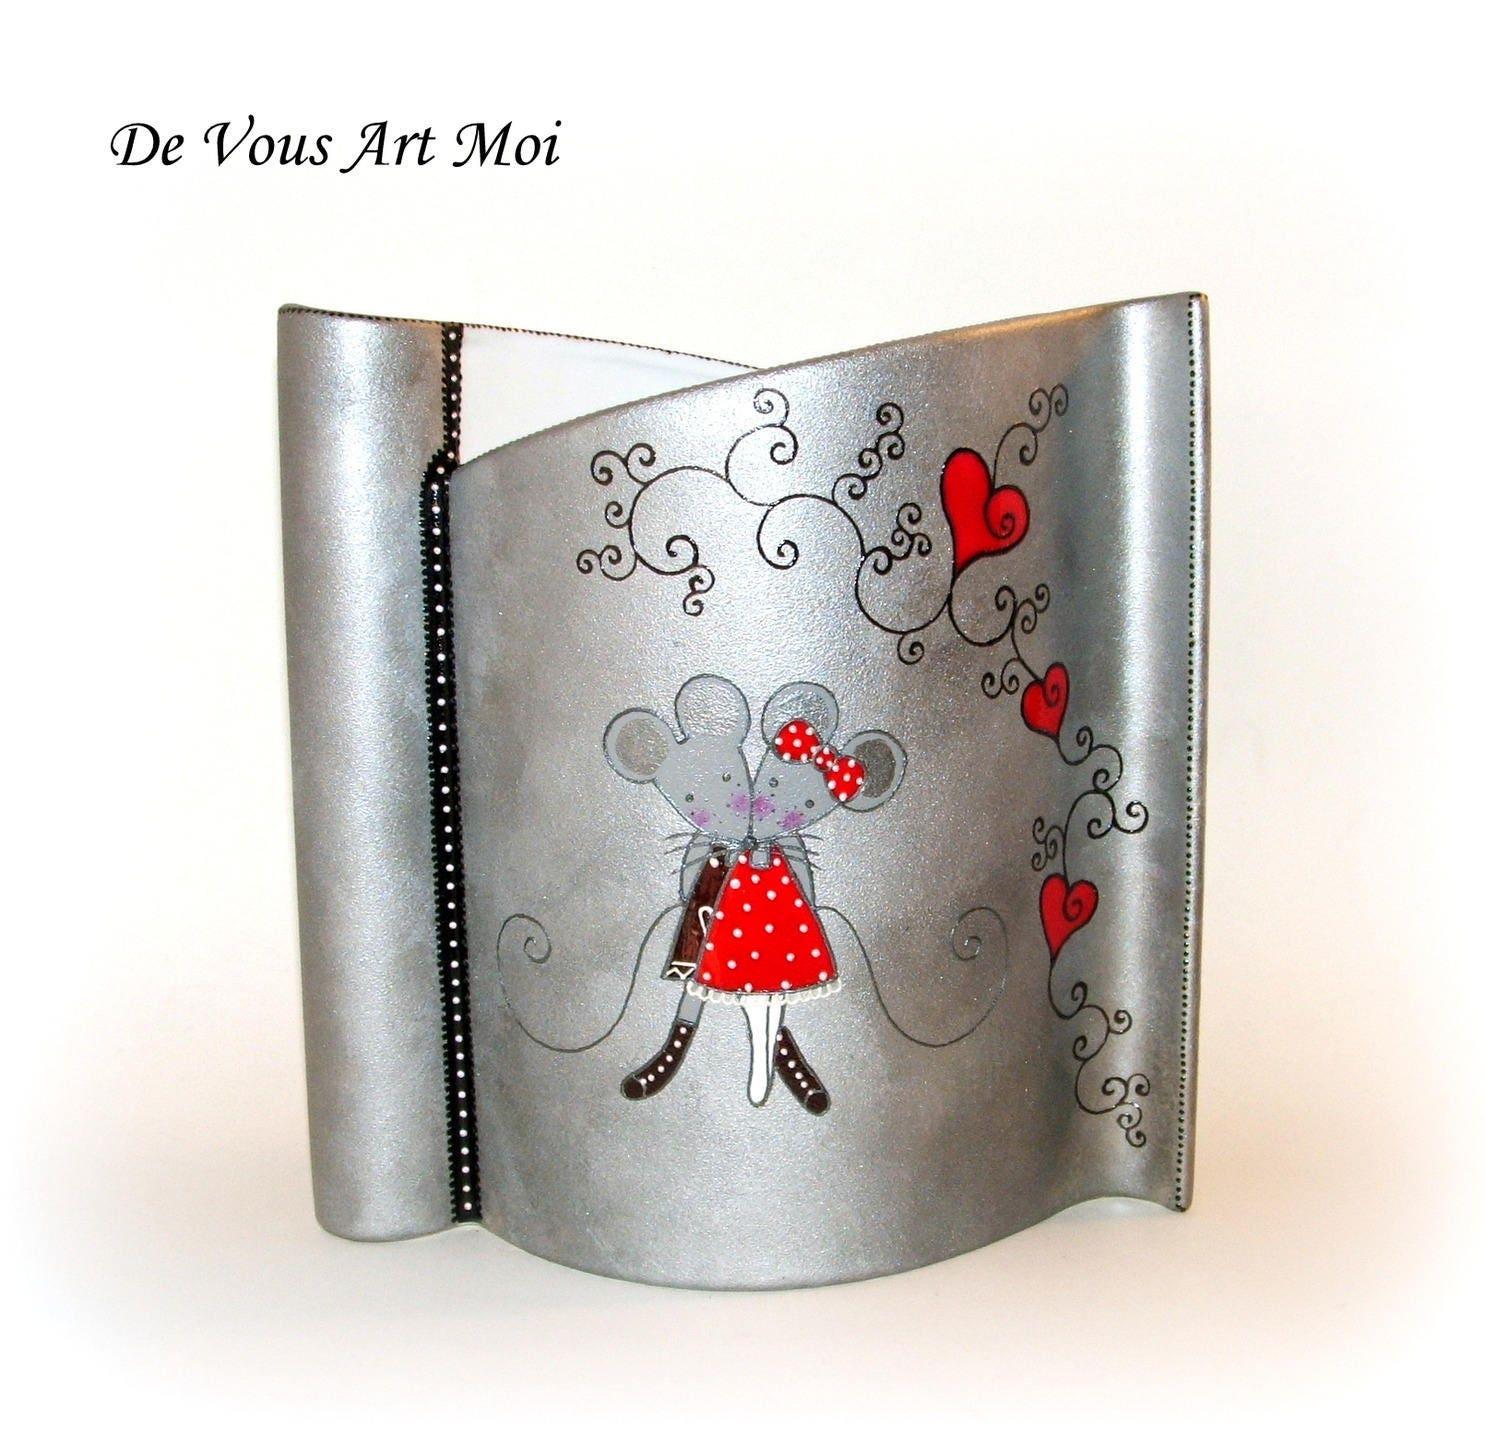 vase moderne design en porcelaine couple de souris peint la. Black Bedroom Furniture Sets. Home Design Ideas